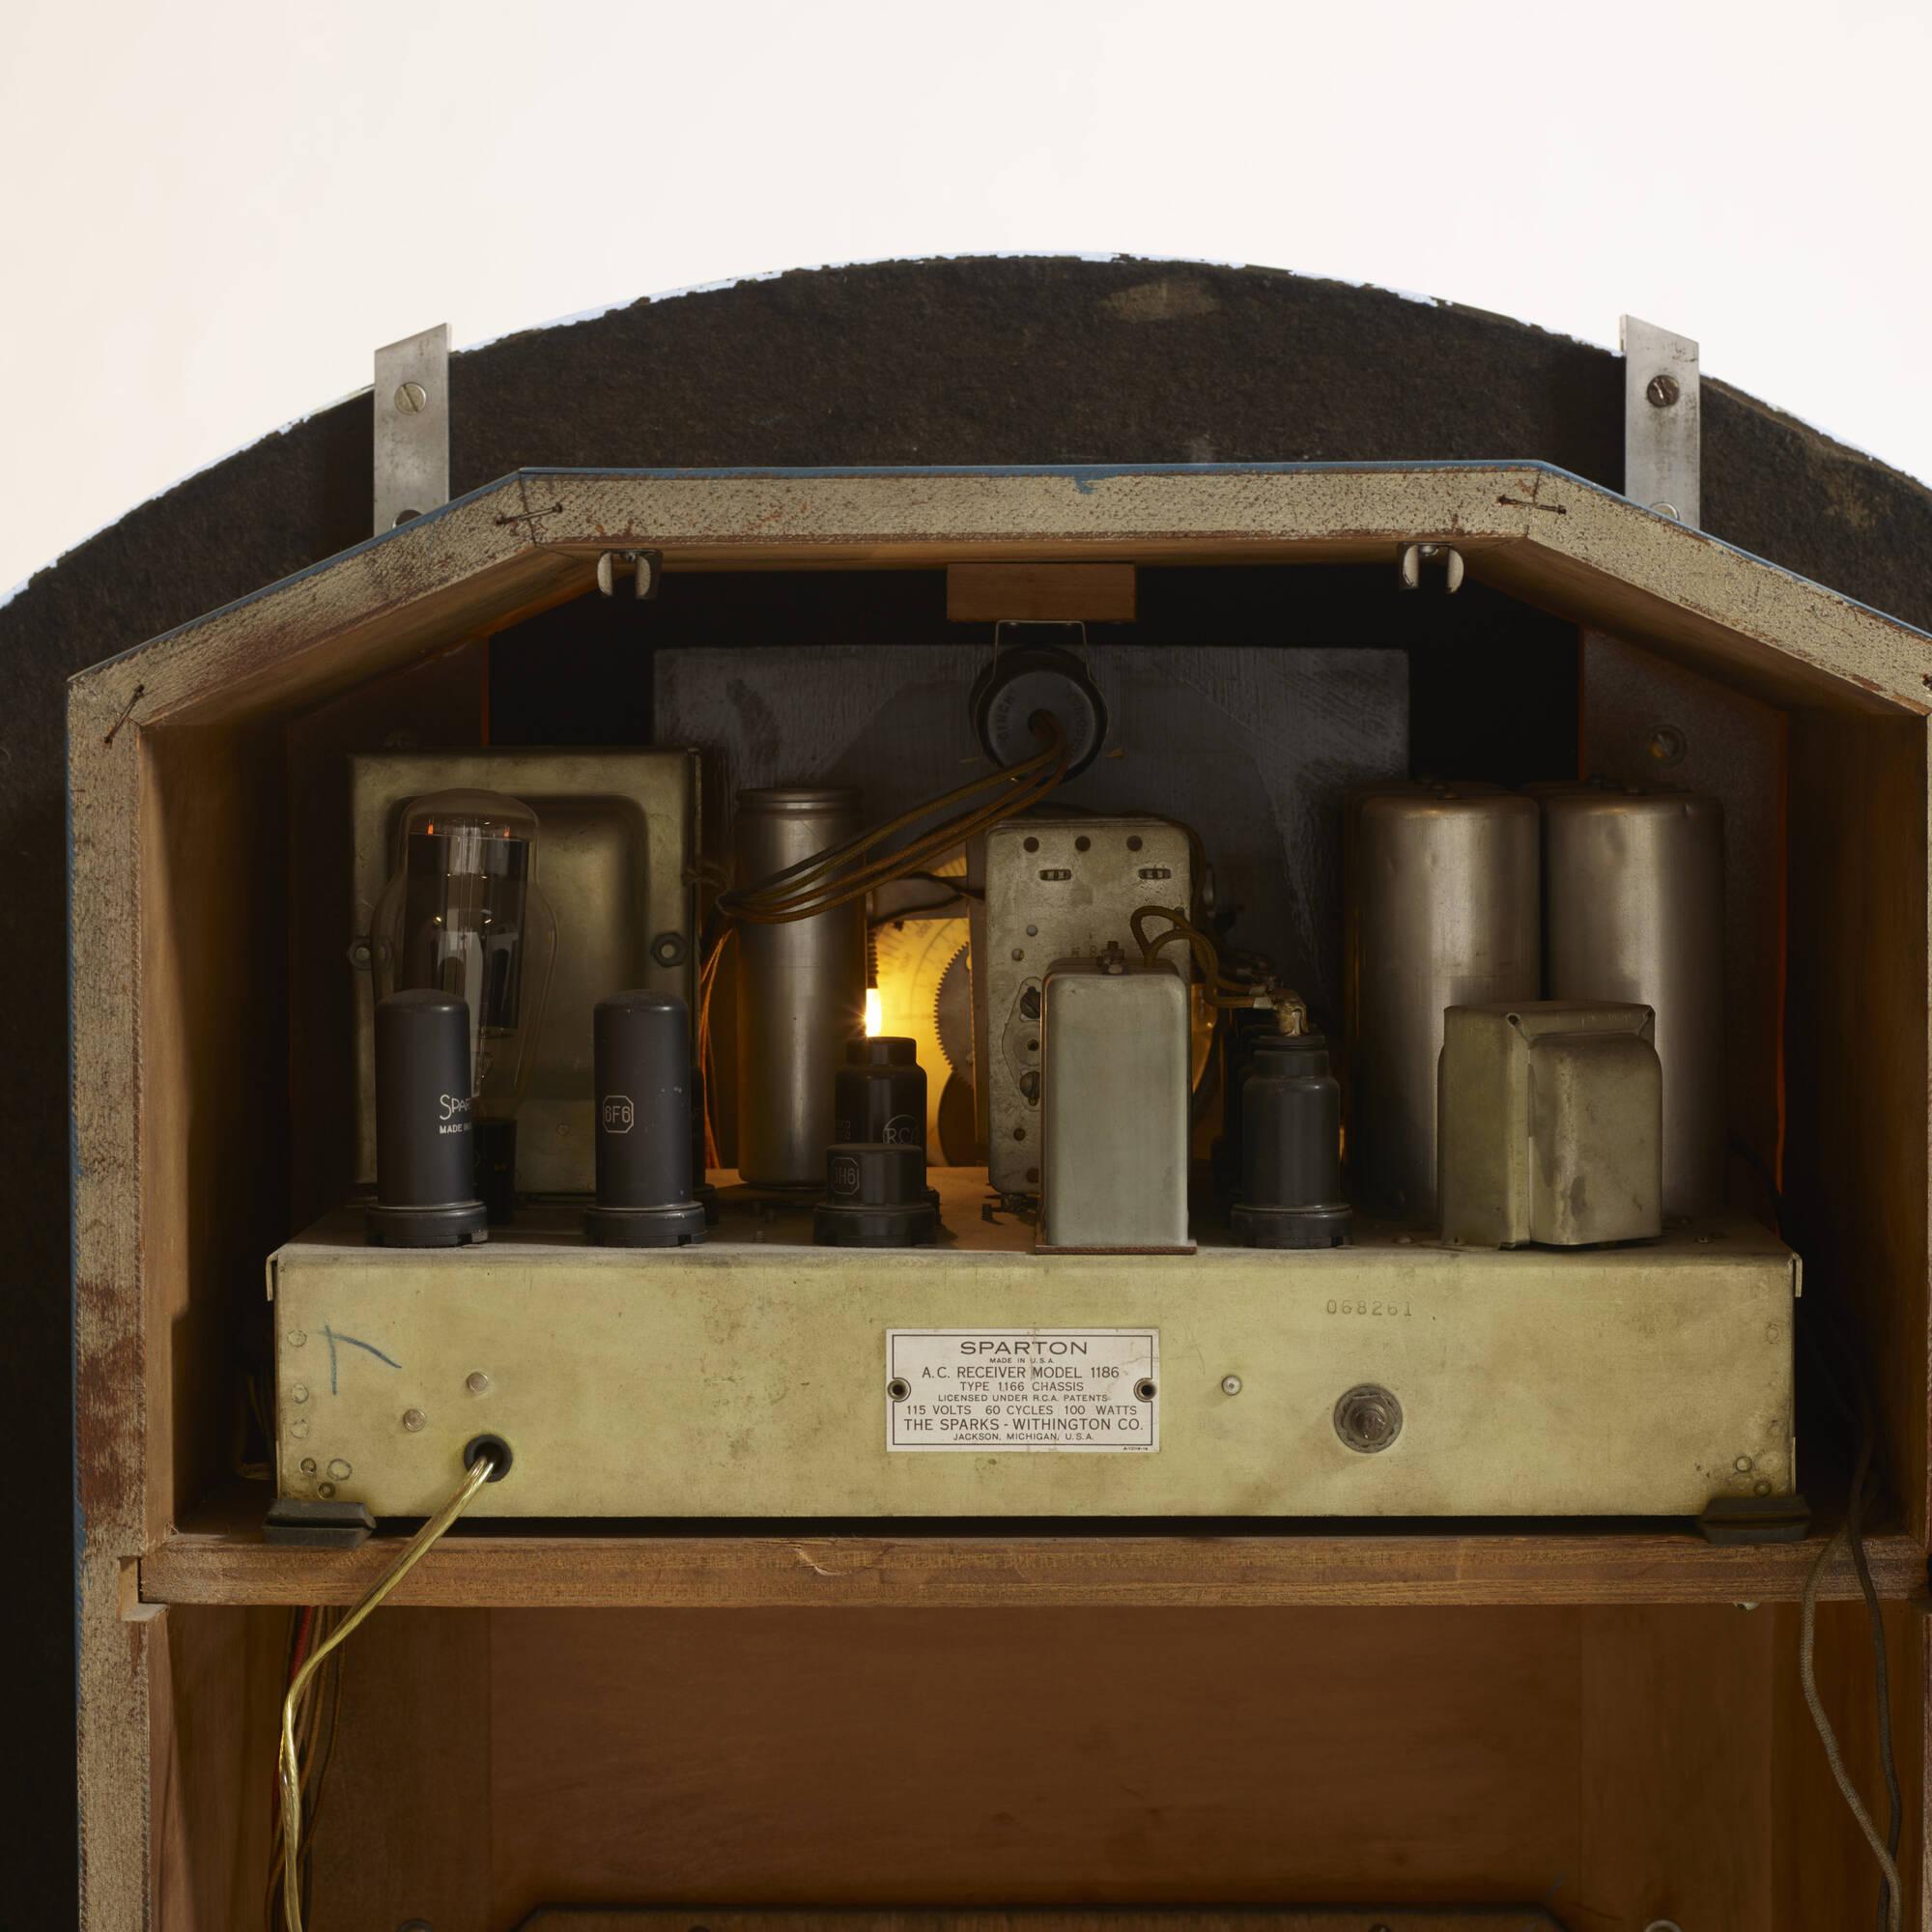 7: Walter Dorwin Teague / Nocturne radio, model 1186 (3 of 3)